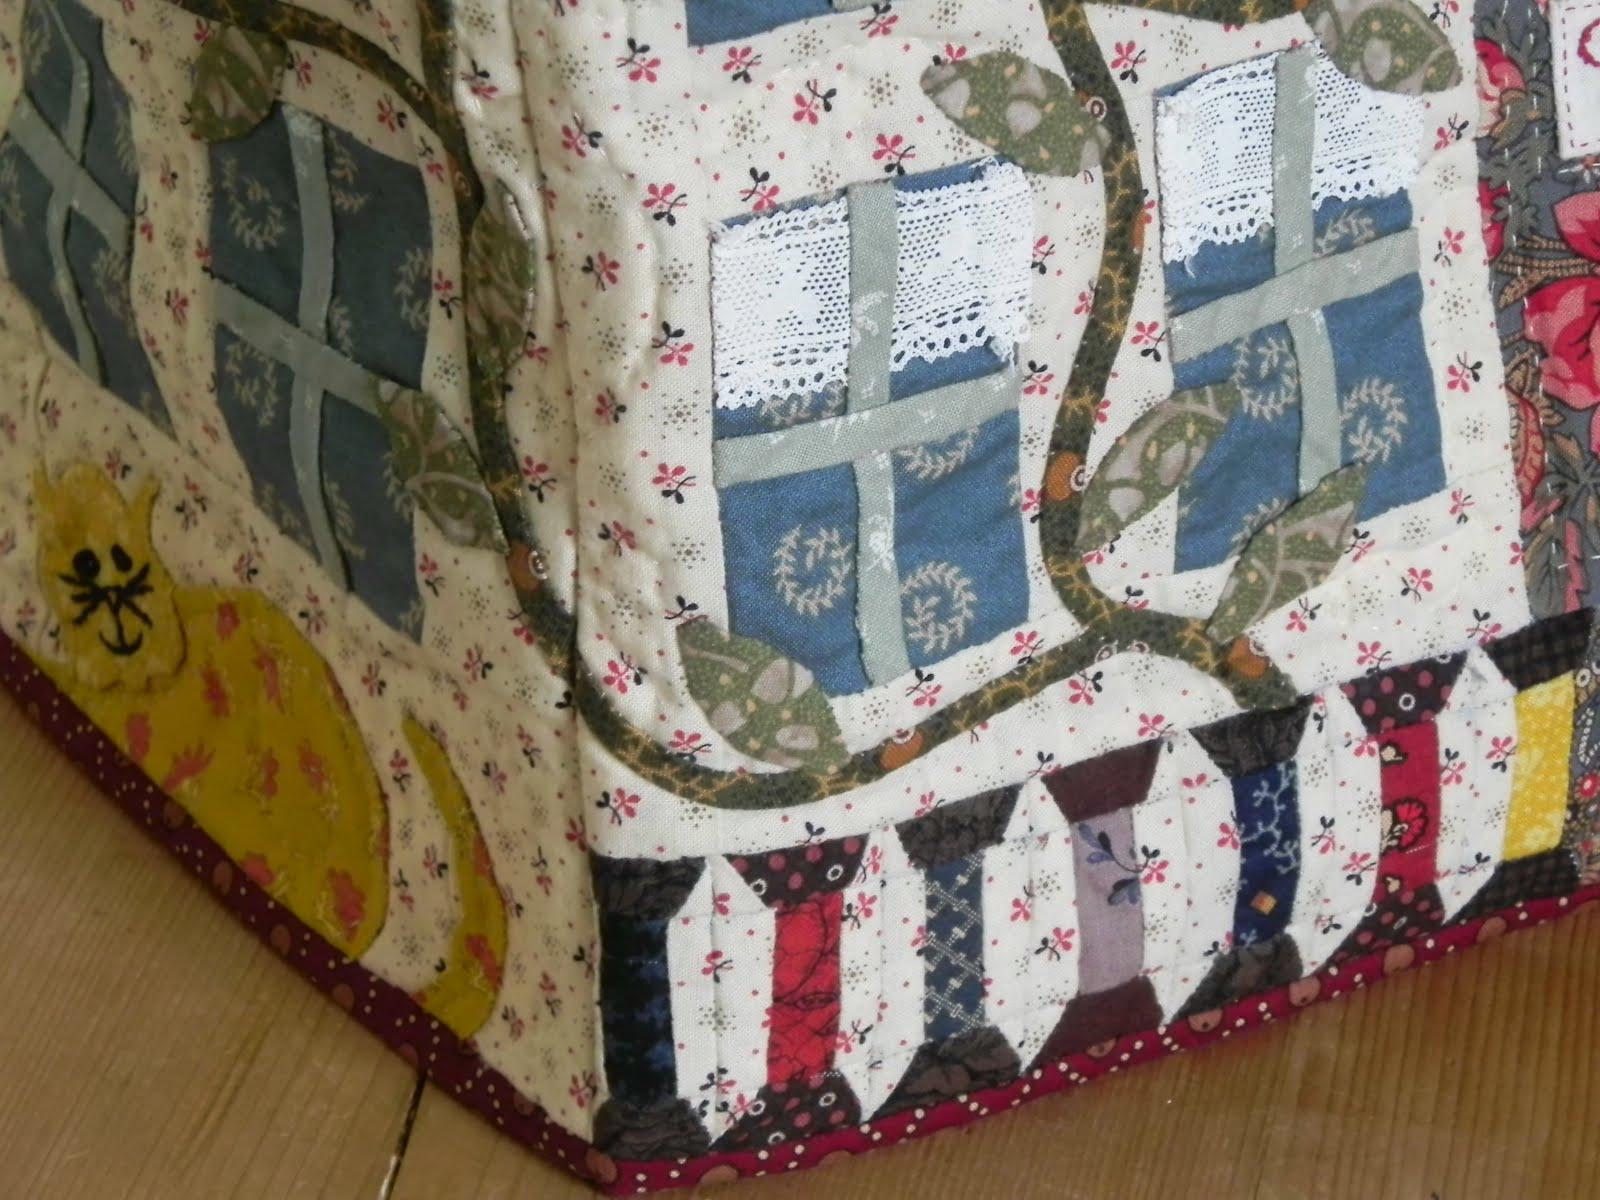 Connysquilts naaimachine hoes af en patroon te koop - Quilts gele ...